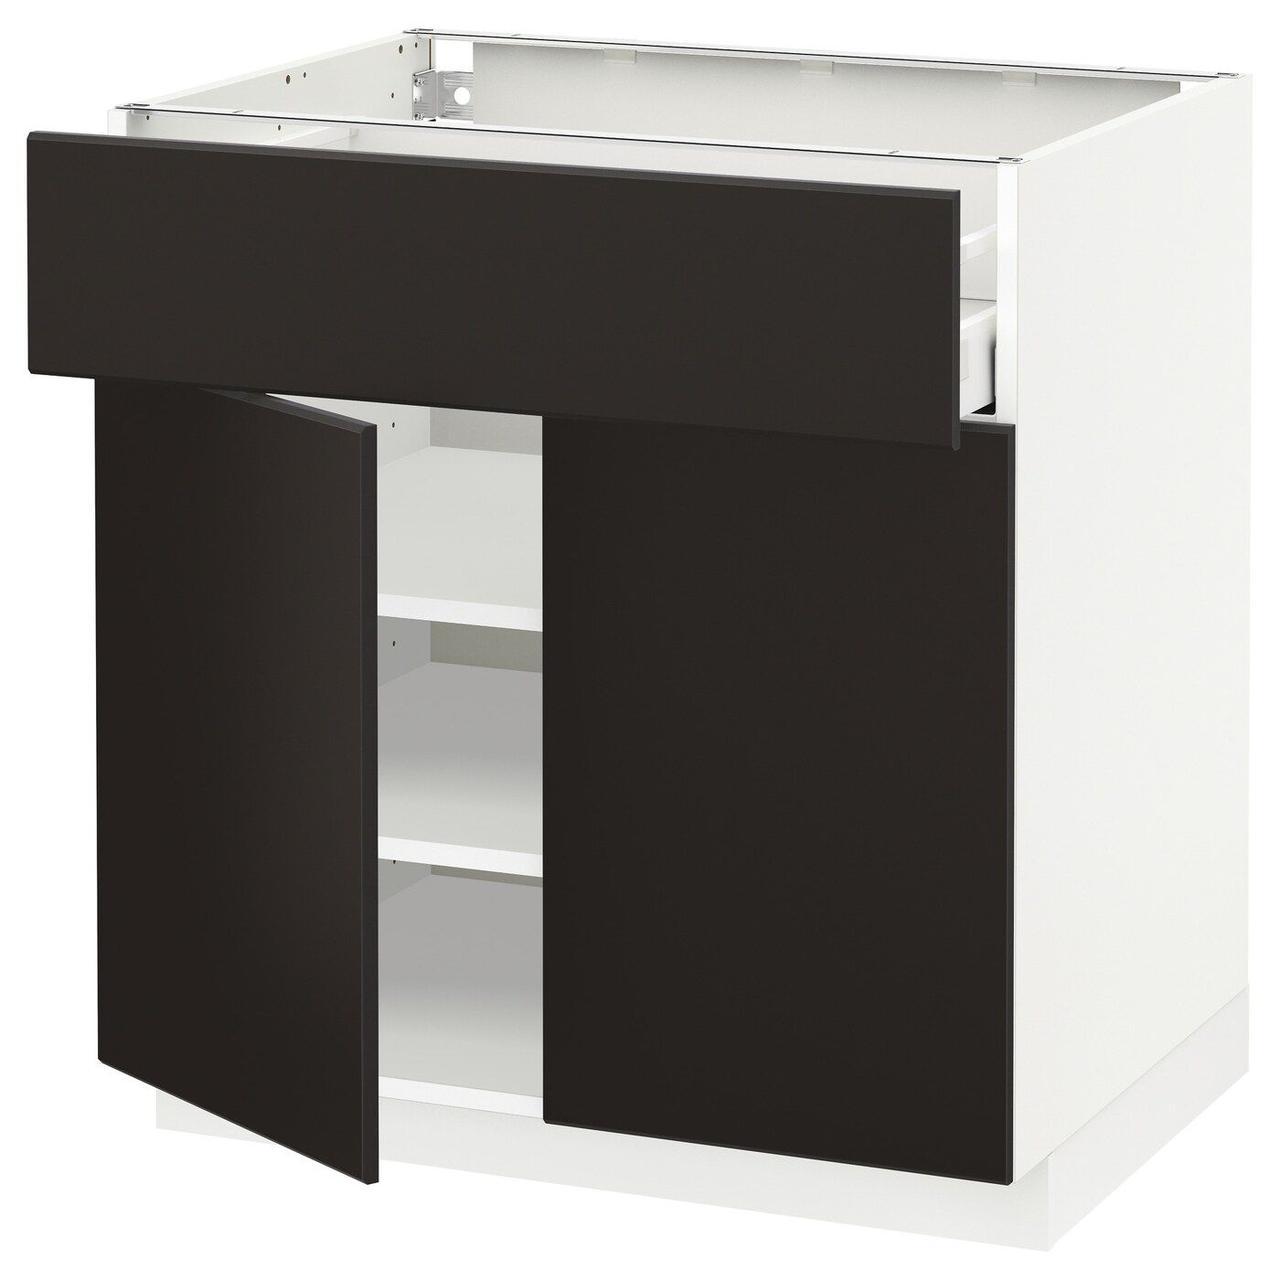 IKEA METOD / MAXIMERA (ІКЕА МЕТОДИ / MAXIMERA) 39377695